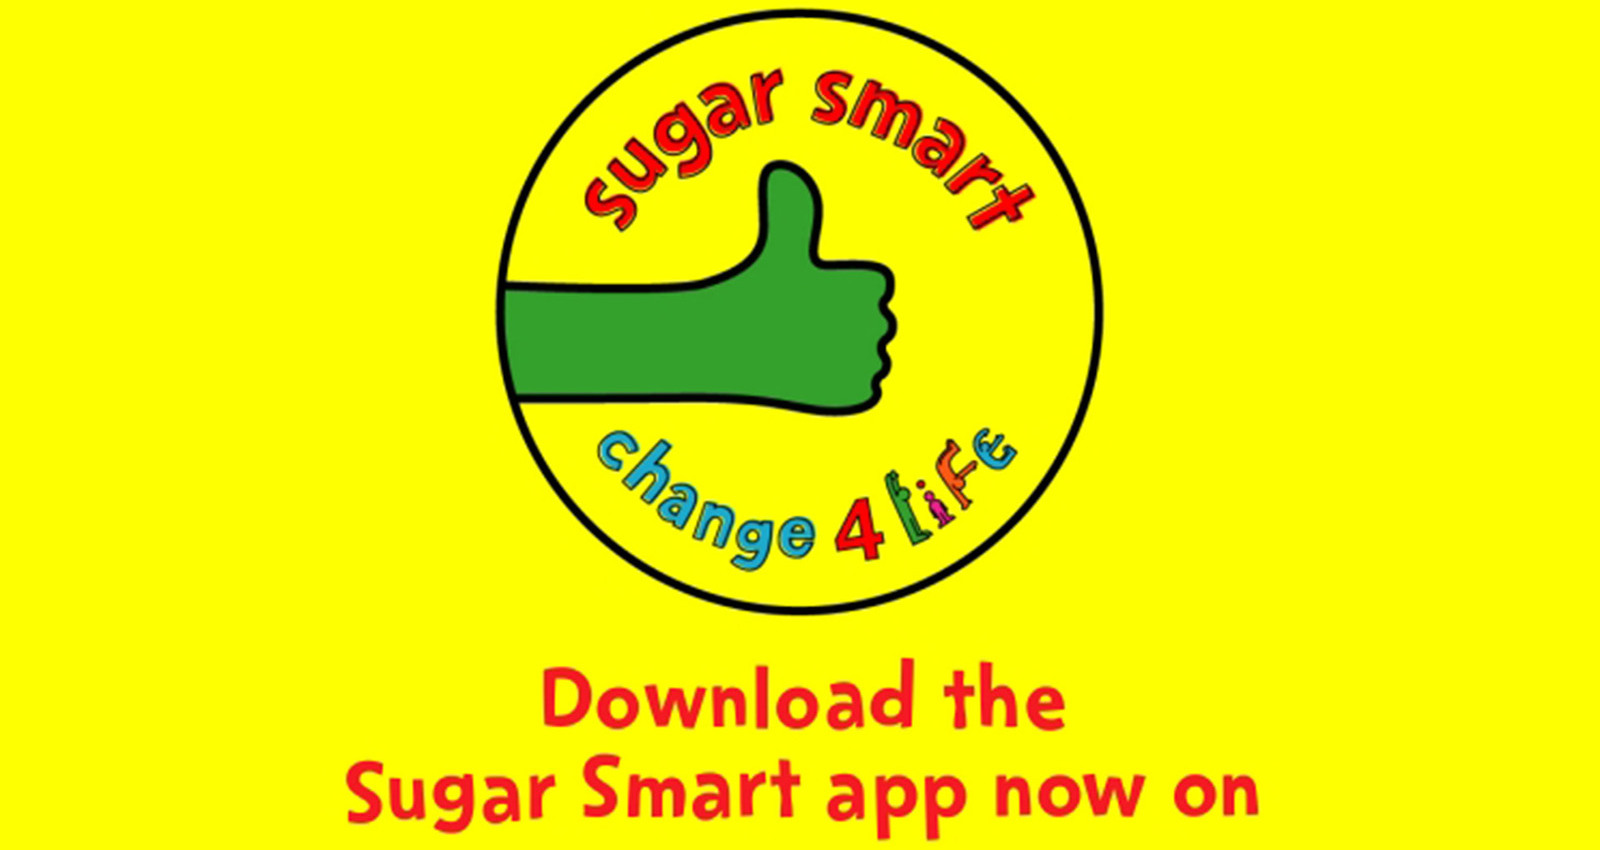 Public Health England - Change 4 Life - Sugar Smart